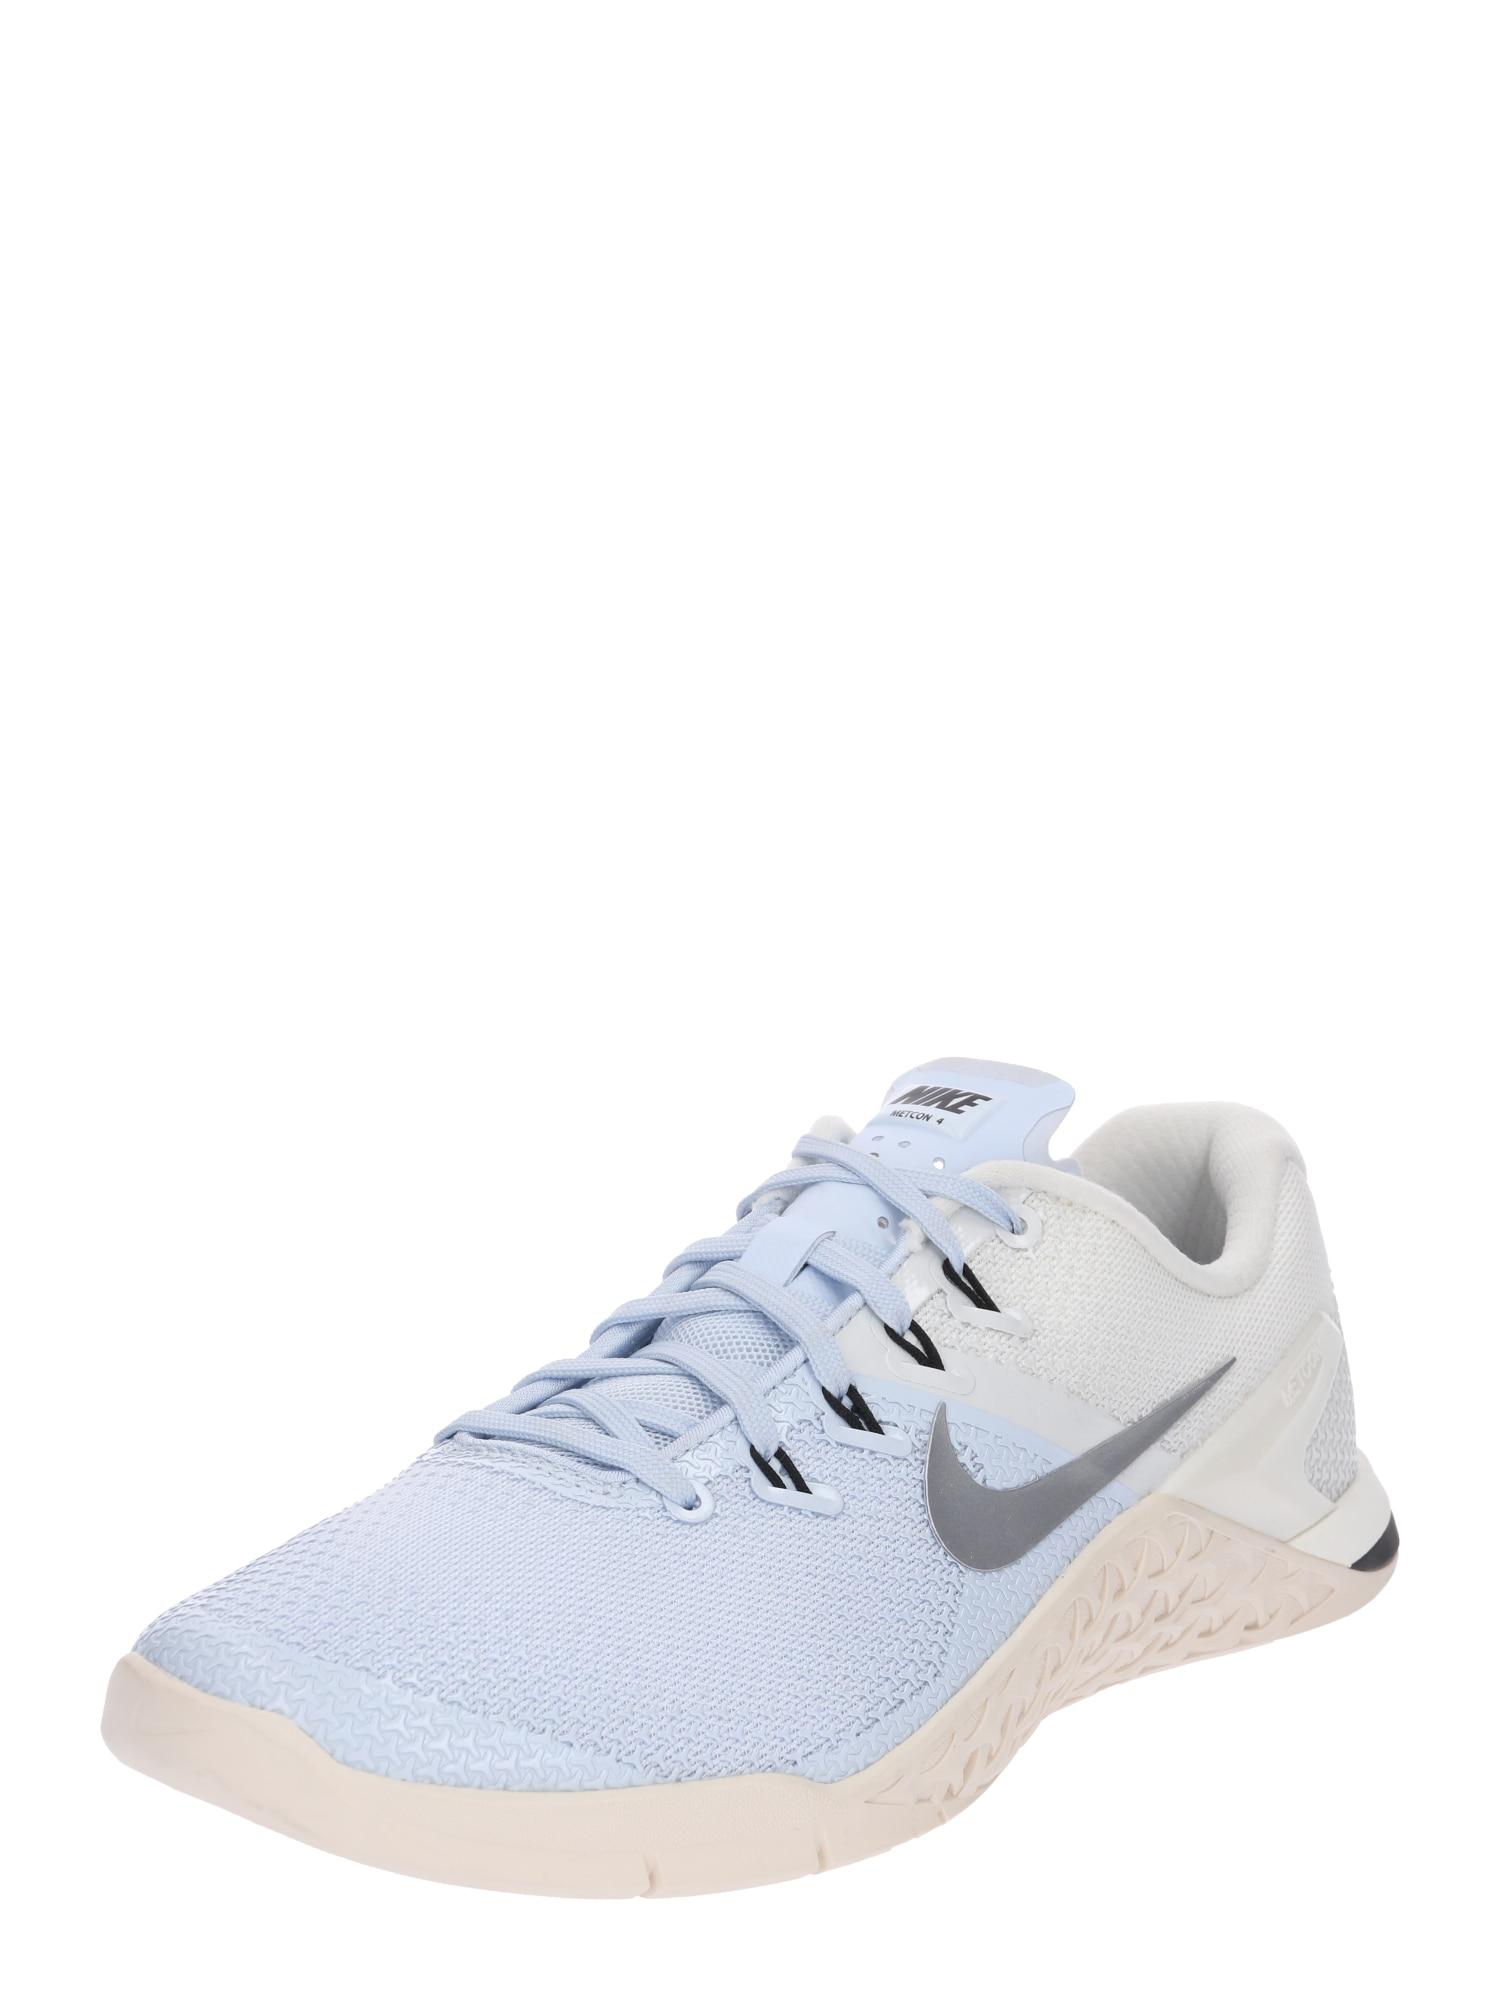 Sportovní boty Nike Metcon 4 XD Metallic světlemodrá bílá NIKE